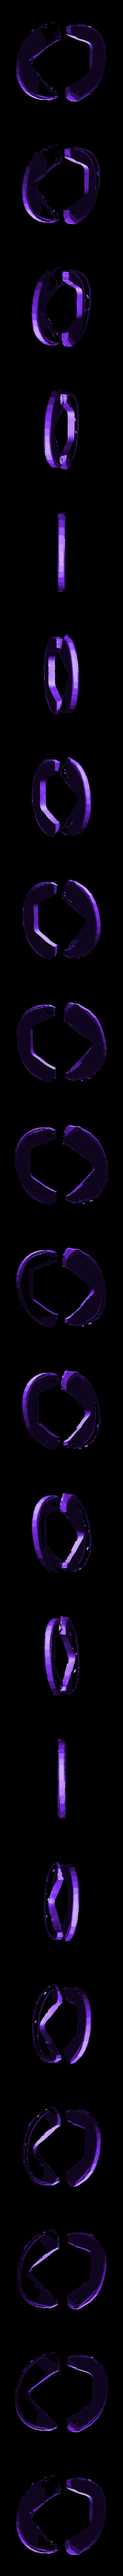 shoulder_0.2mm_loose.stl Download free STL file sagesumi remix • 3D printable model, CyberCyclist